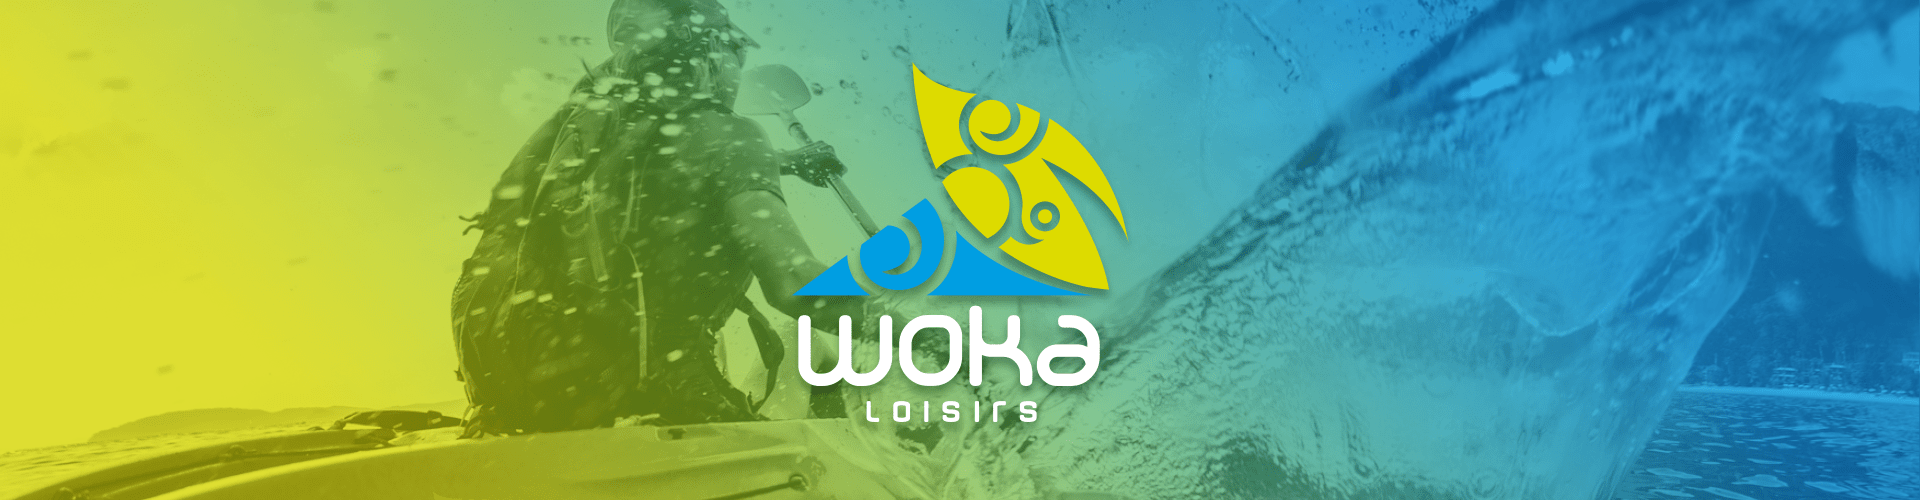 Woka loisirs - Protection des données